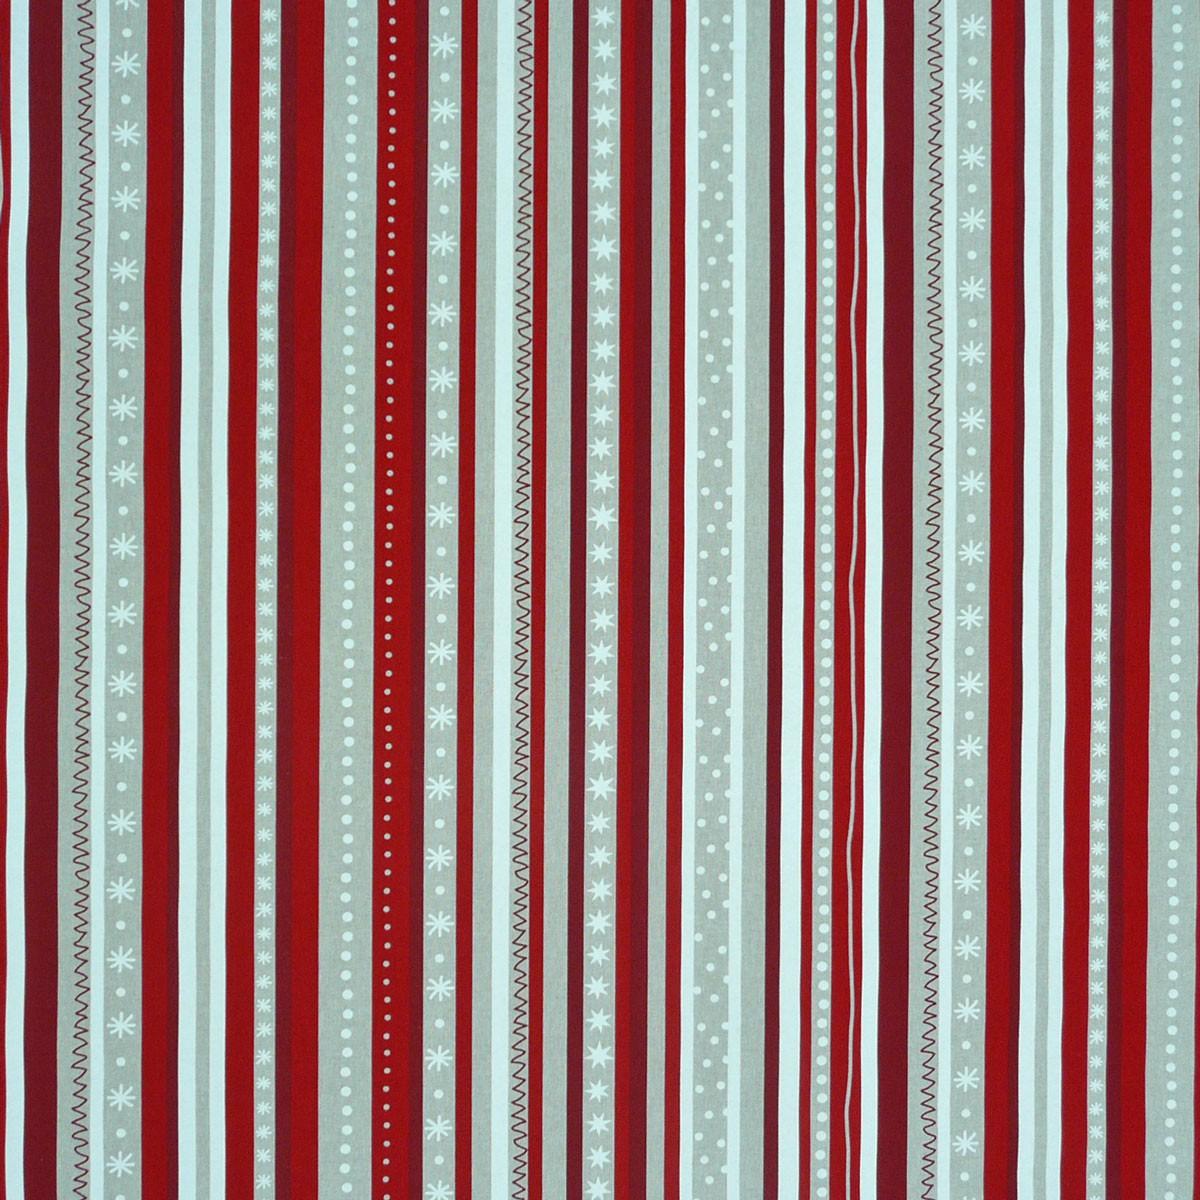 gardinenstoff stoff dekostoff meterware streifen weihnachten rot gardinen gardinenstoffe dekostoffe. Black Bedroom Furniture Sets. Home Design Ideas